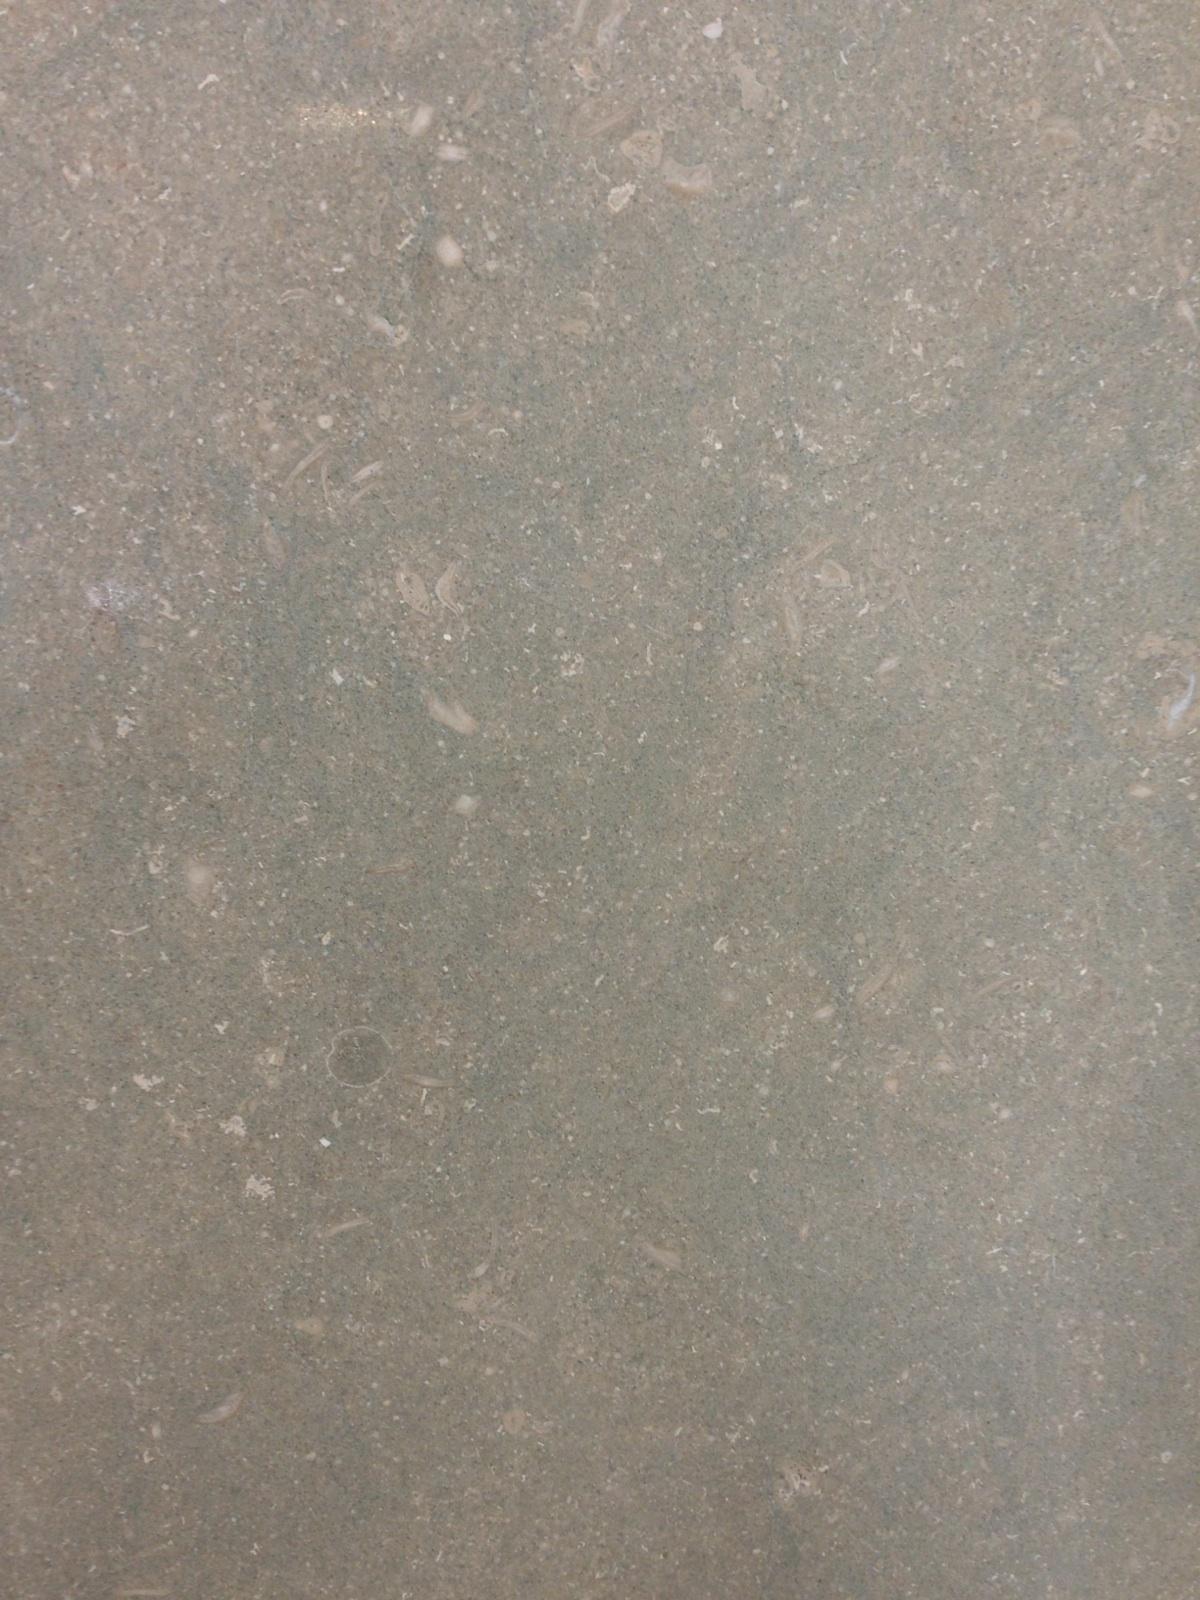 Sea Grass Limestone close up